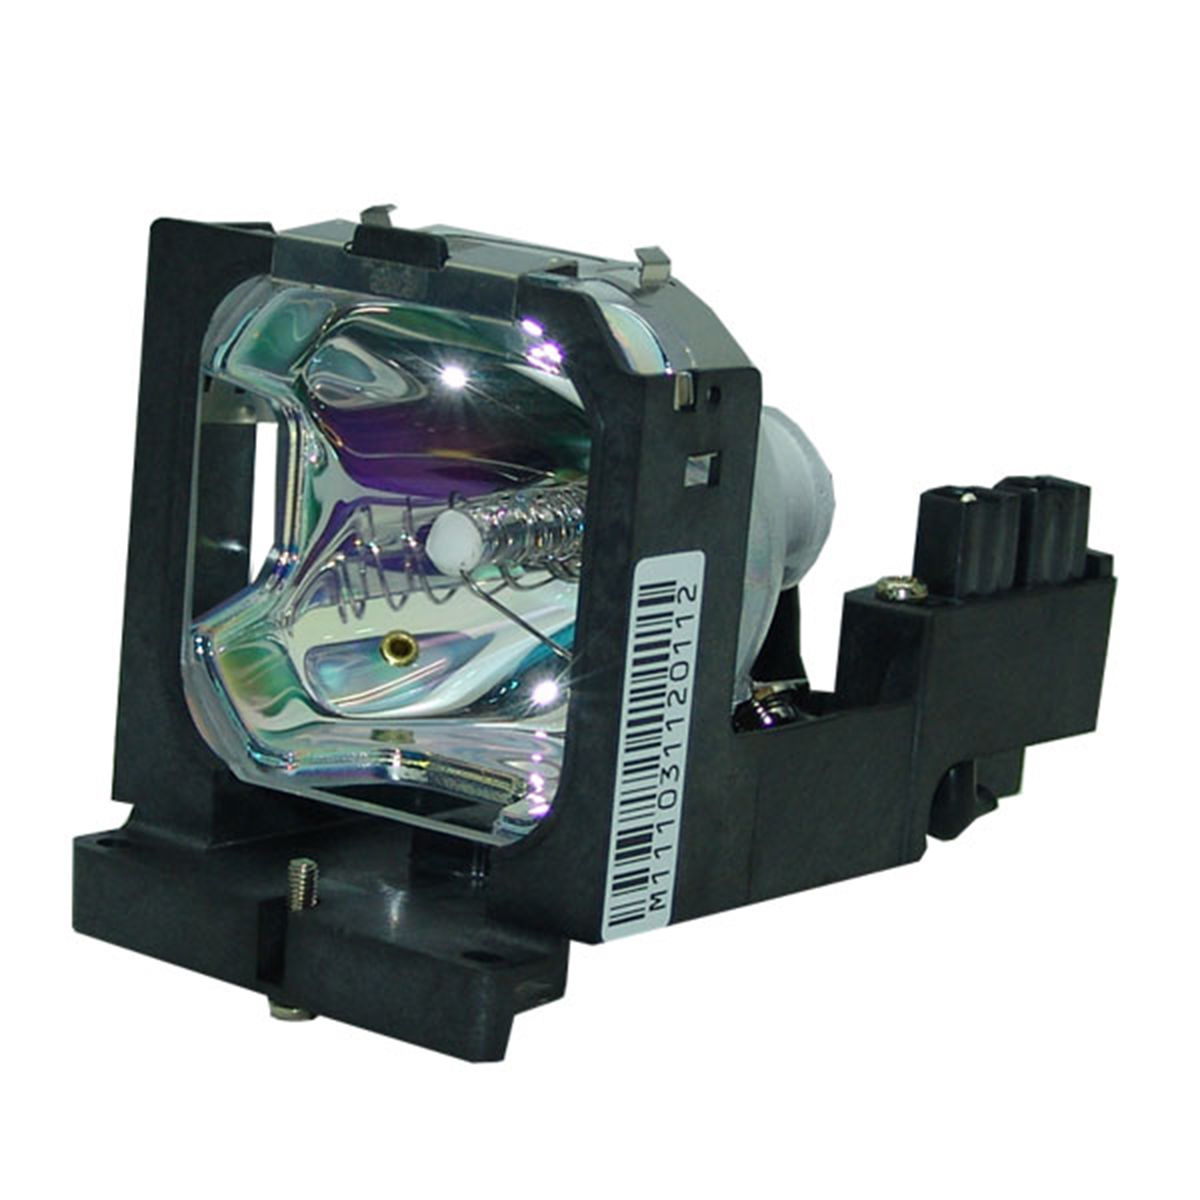 Projector Lamp Bulb POA-LMP69 LMP69 610-309-7589 for SANYO PLV-Z2 PLC-VHD10 with housingProjector Lamp Bulb POA-LMP69 LMP69 610-309-7589 for SANYO PLV-Z2 PLC-VHD10 with housing